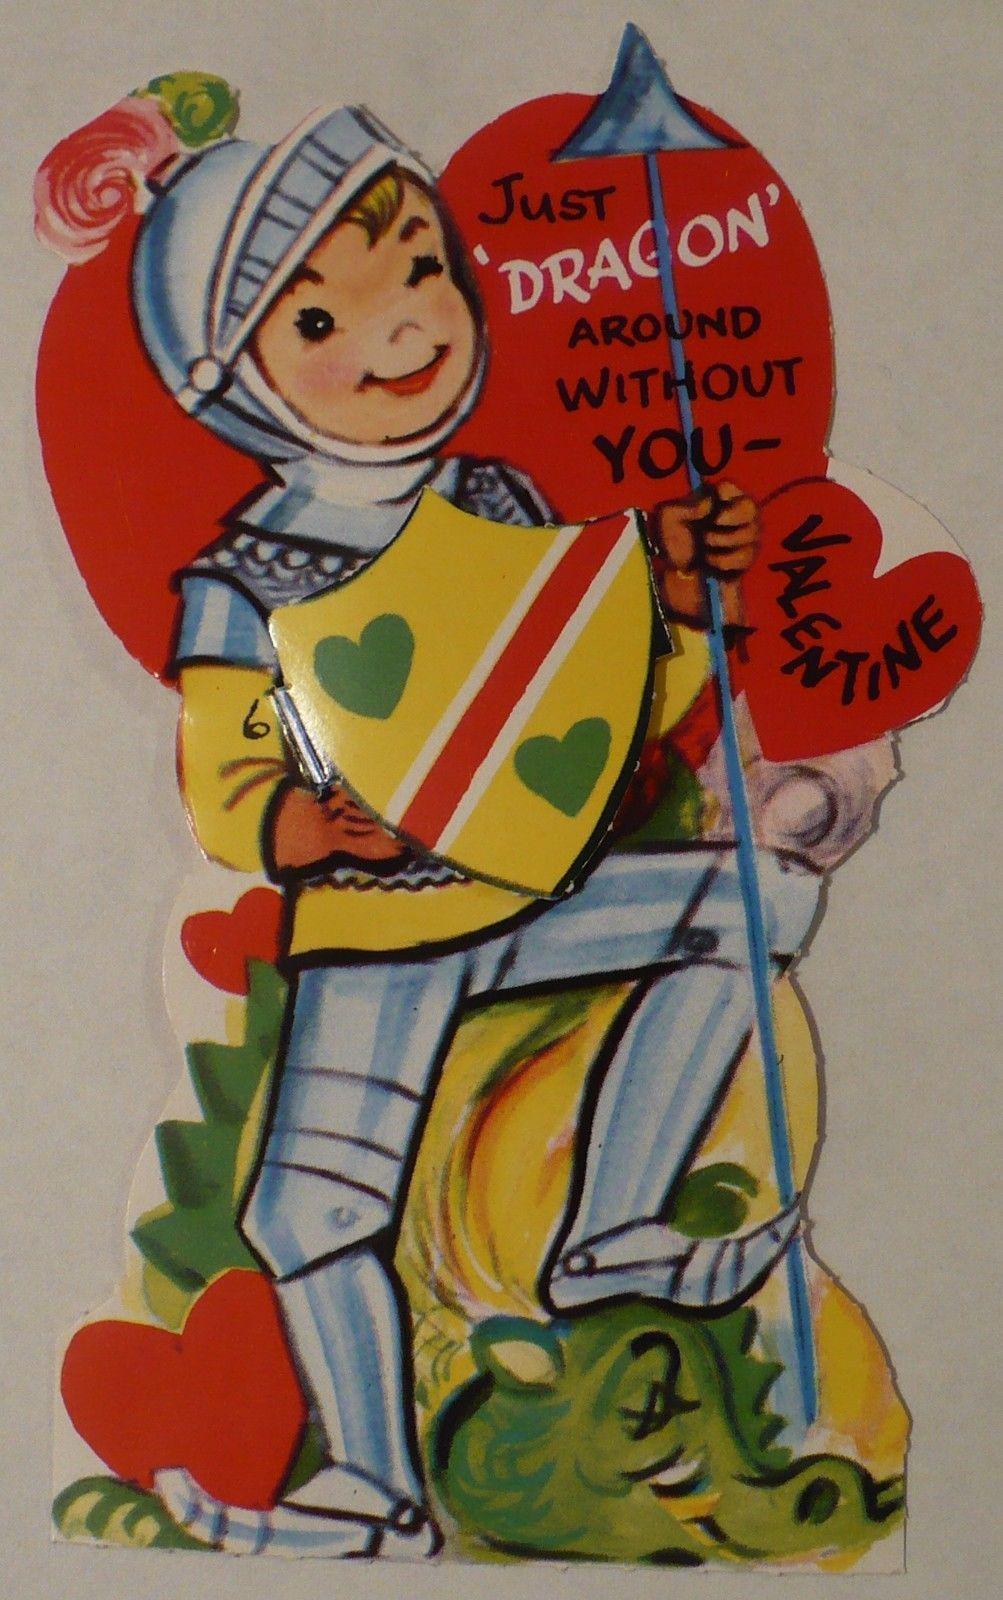 Vtg Valentine's Day Card 50's Knight Shining Armor Dragon   eBay